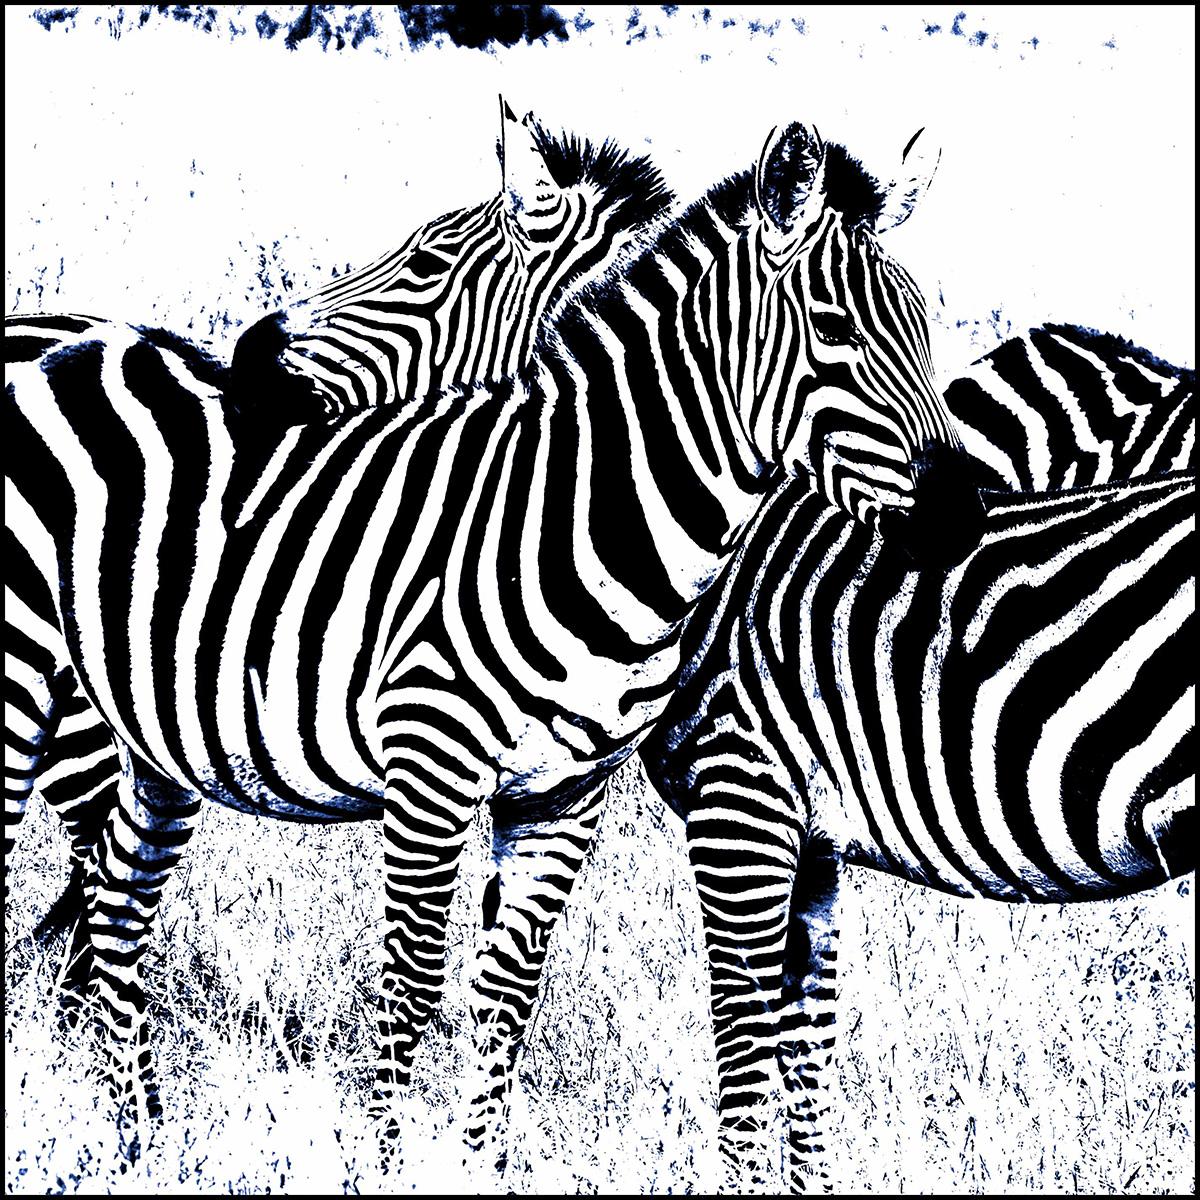 Two Zebras No. 2